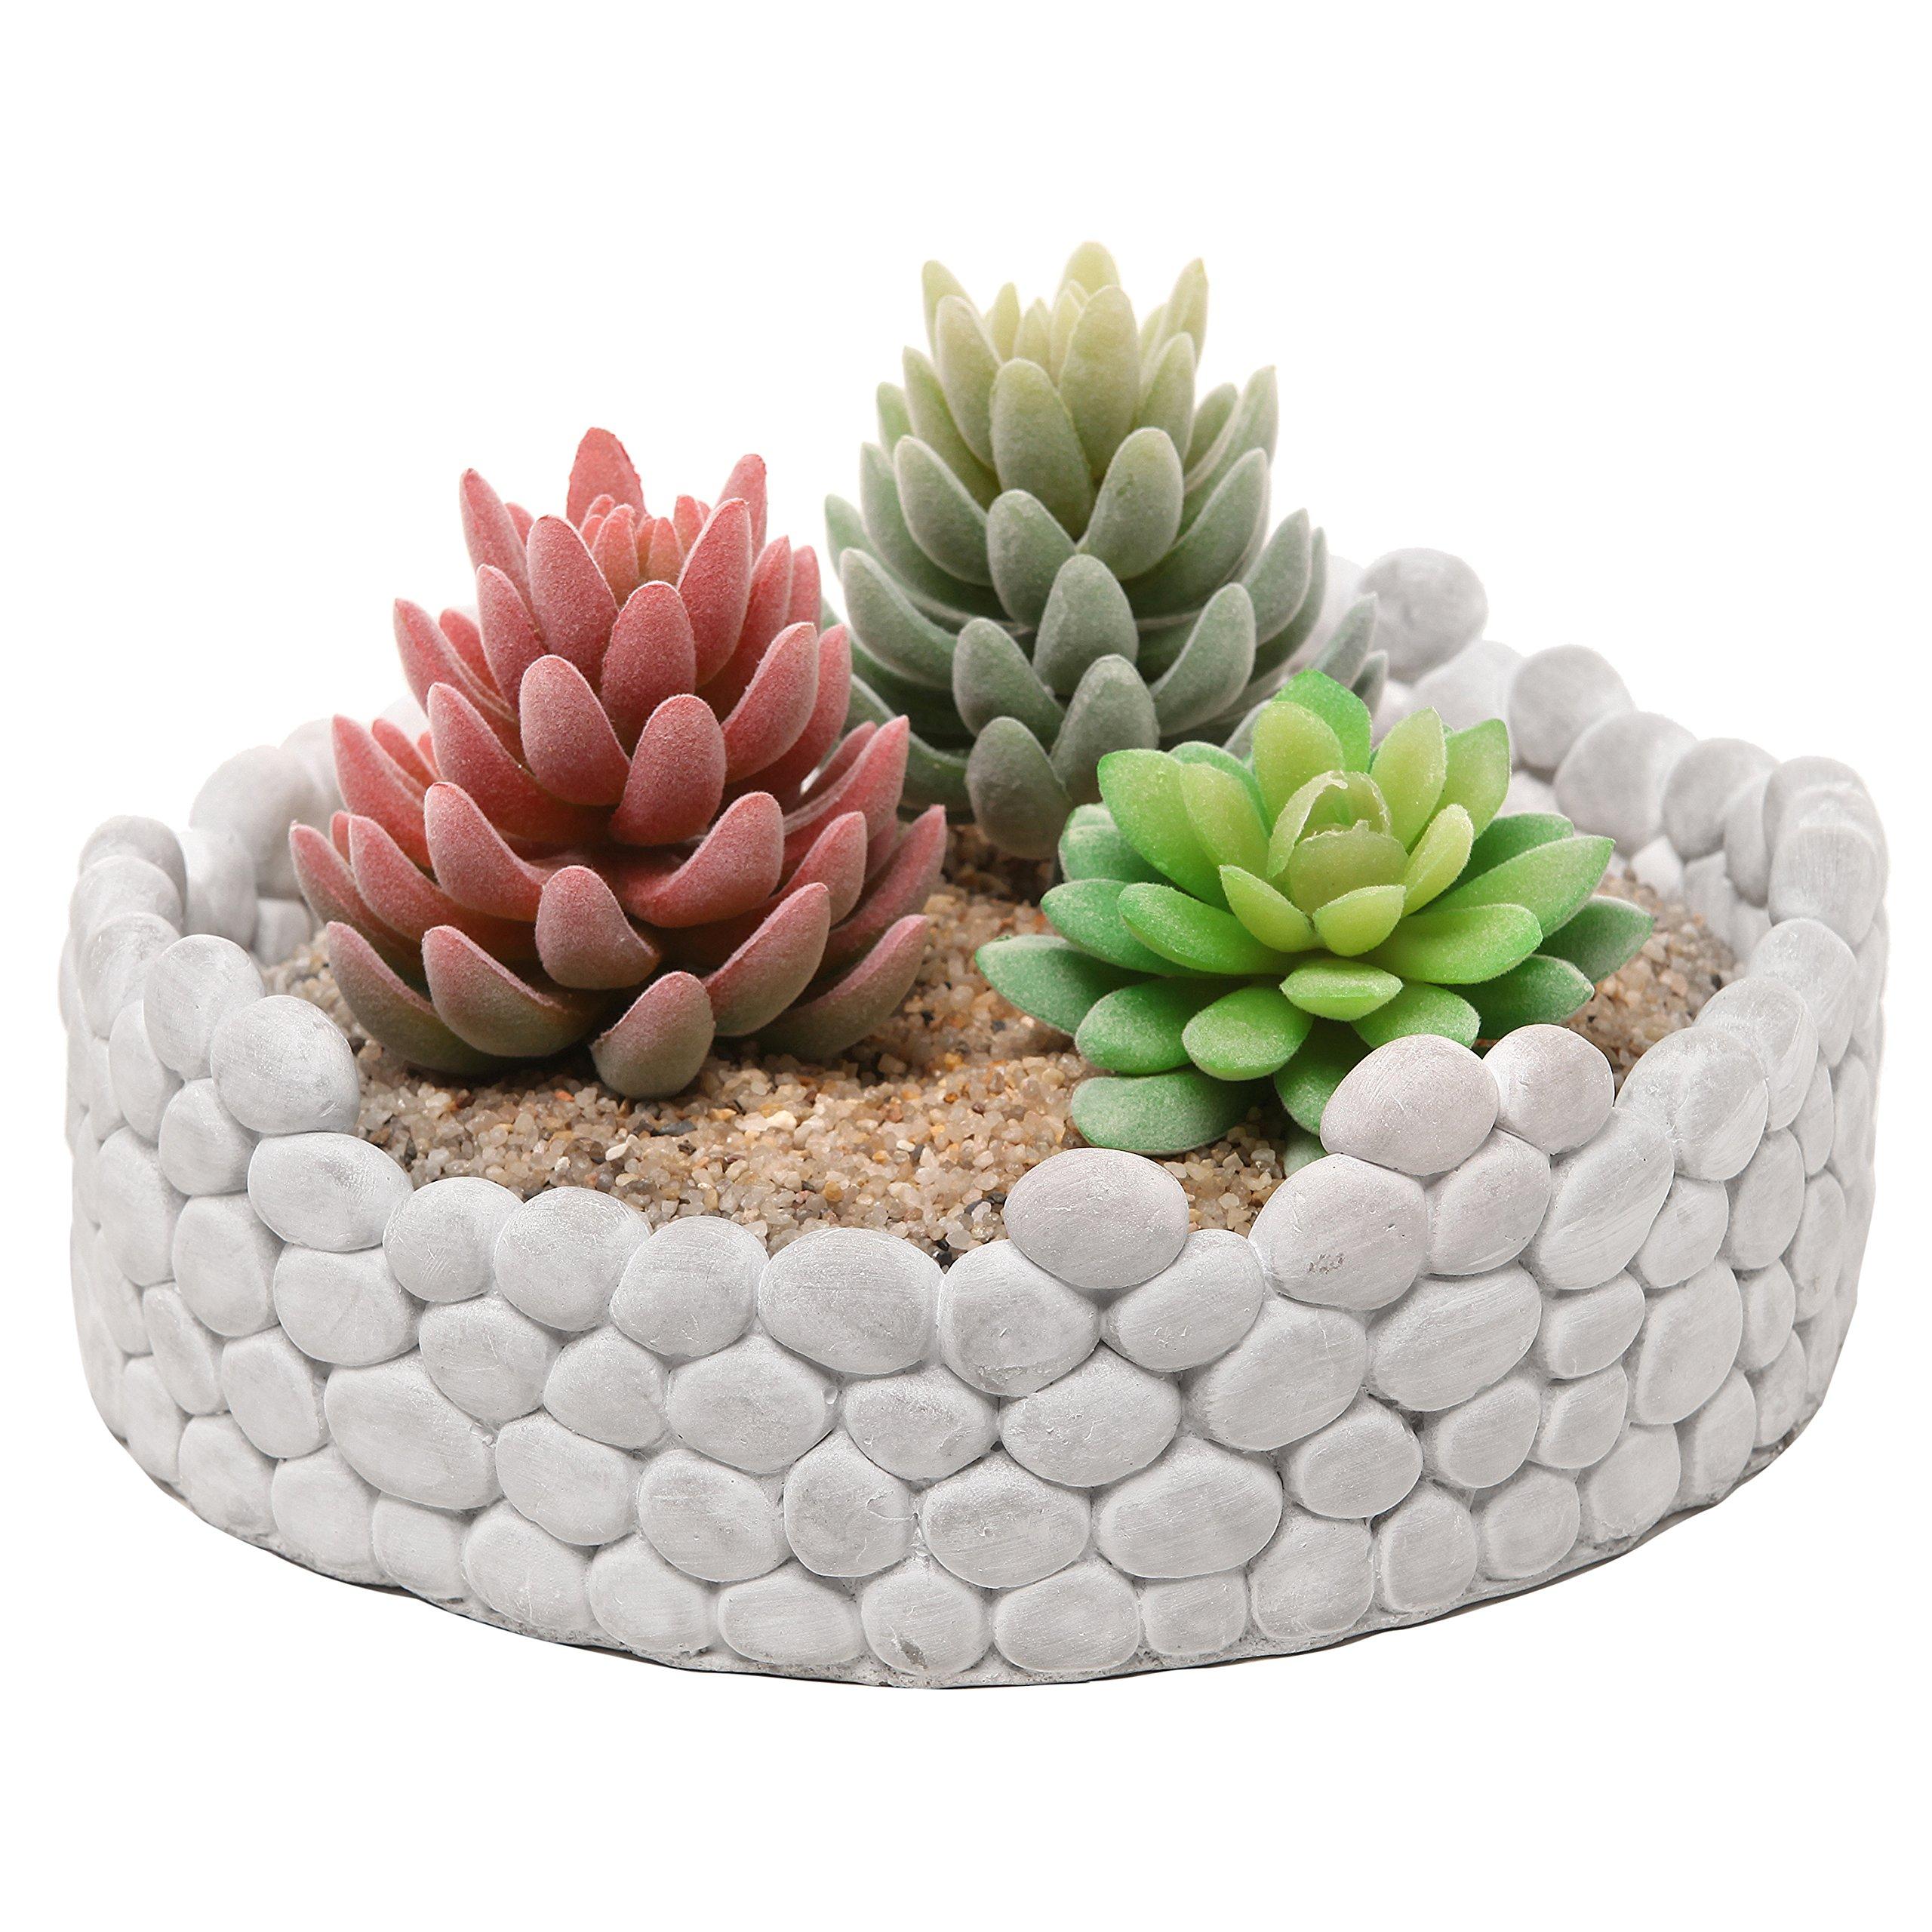 MyGift Decorative Cement Grey Rock Wall Design Plant Holder / Garden Stone Flower Planter - Large 9 Inch